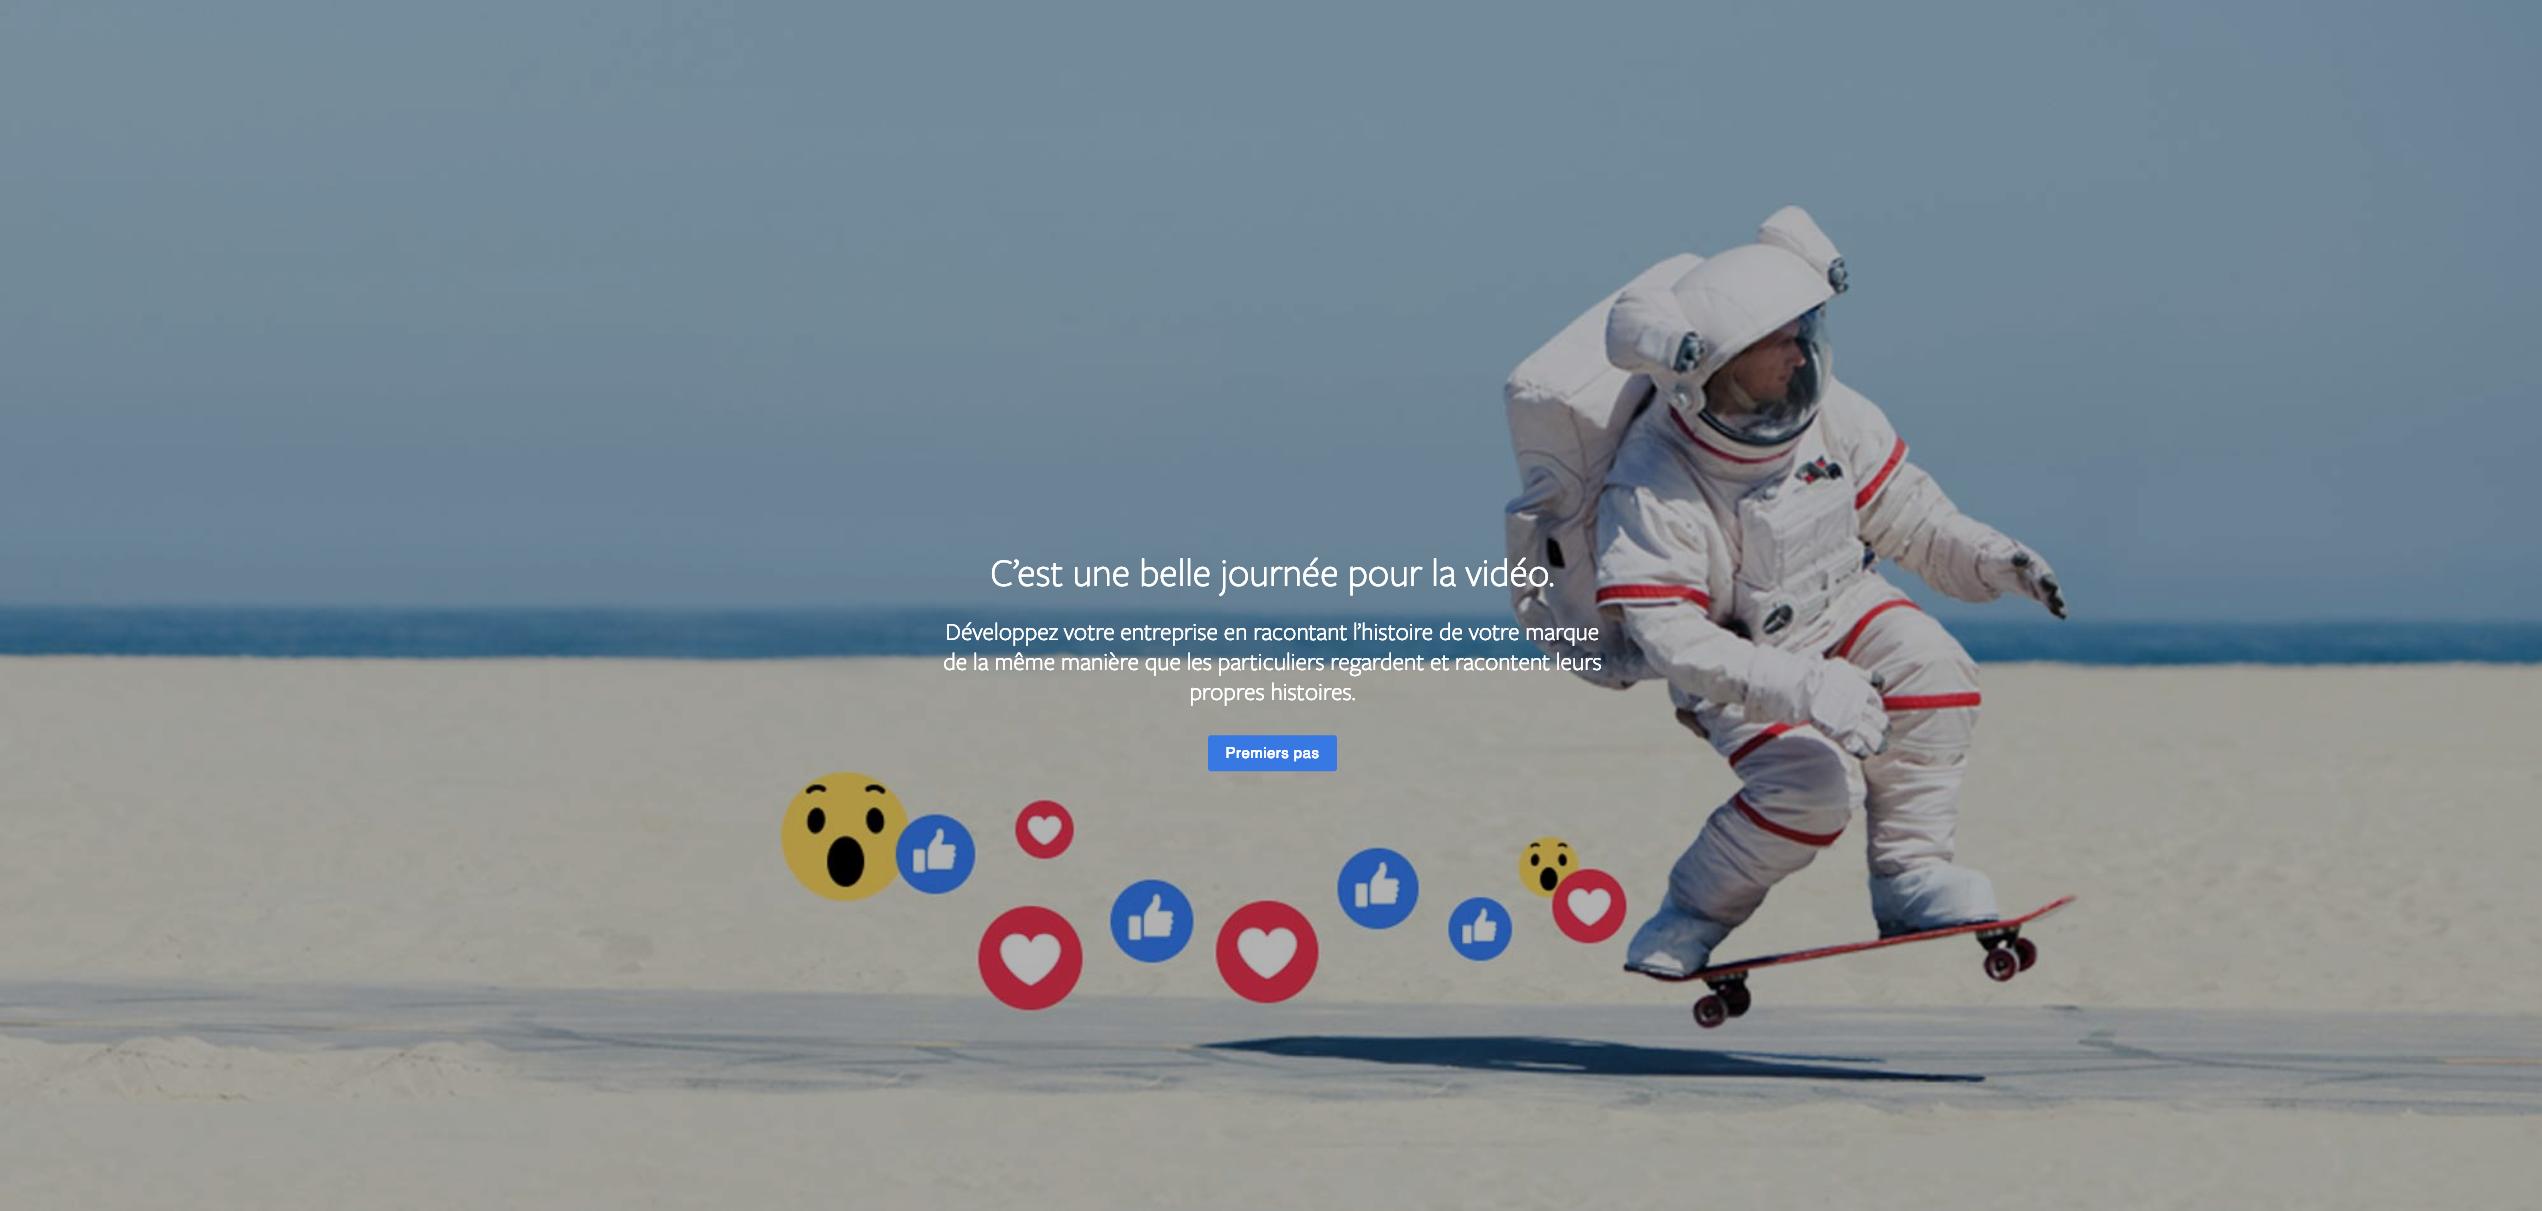 Comment cibler en expert vos campagnes vidéo Facebook ?